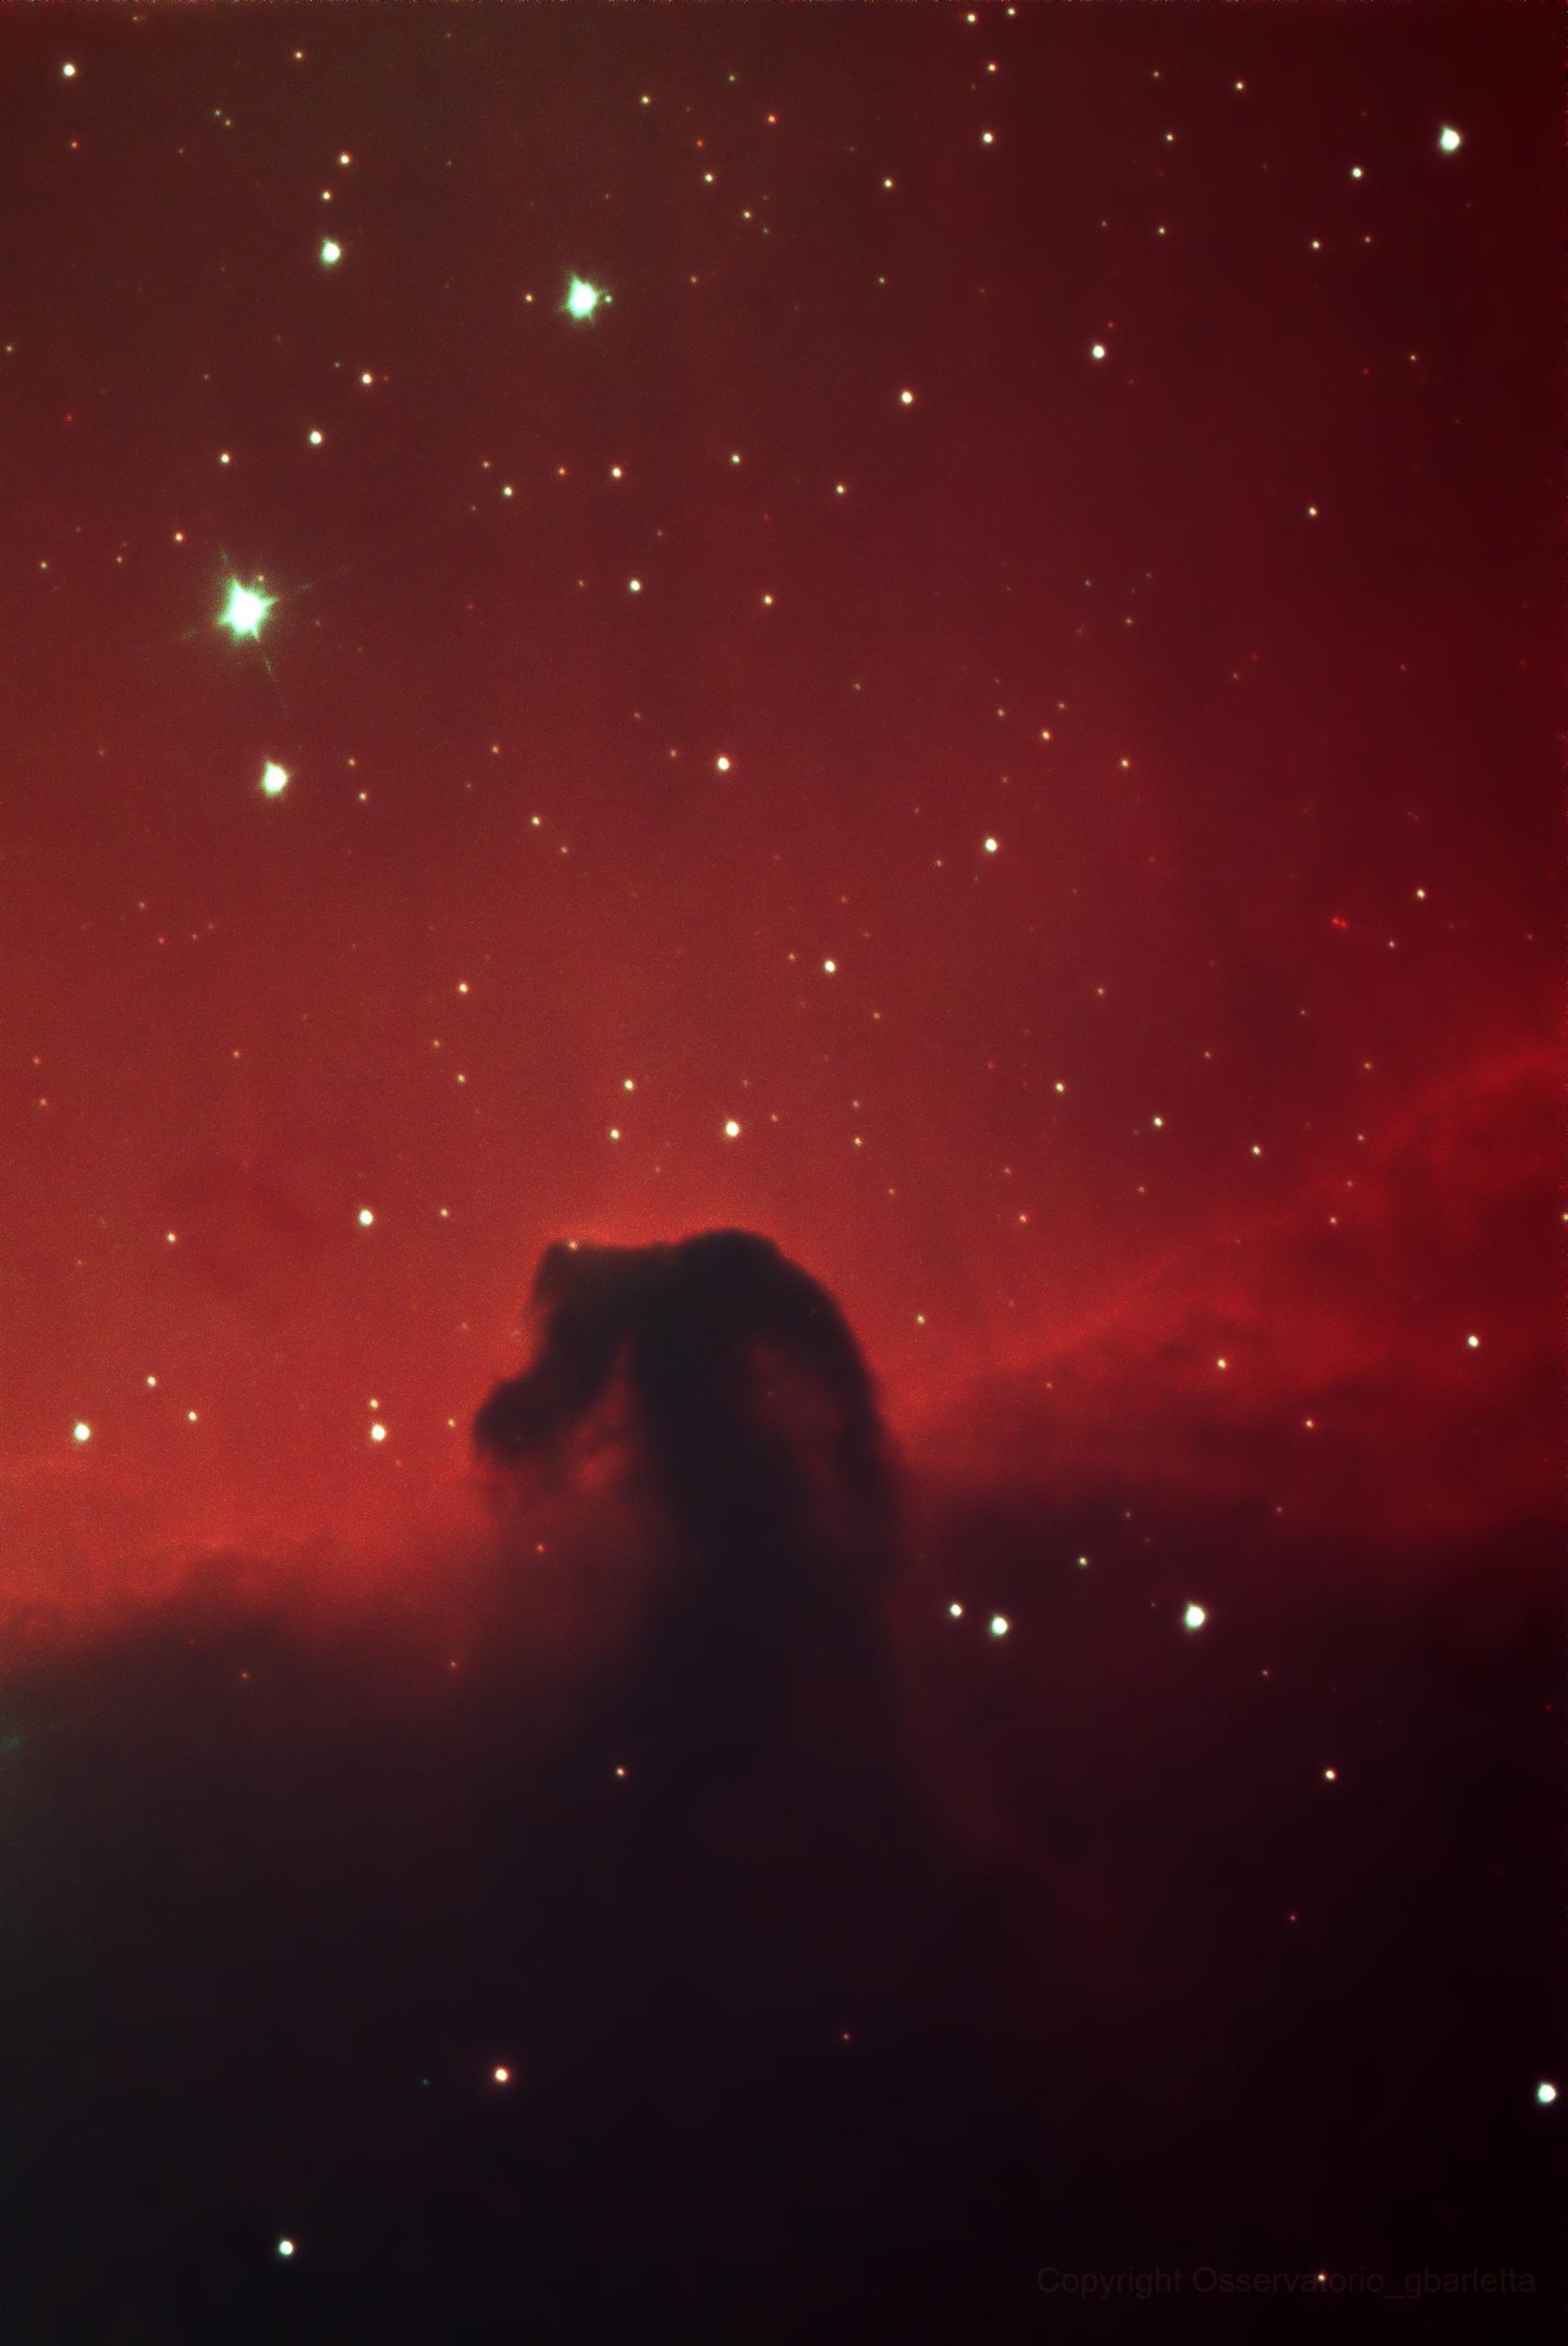 https://astrofilicernusco.org/storage/2021/03/2021-01-11_B33testa-di-cavallo_acaobs.jpg